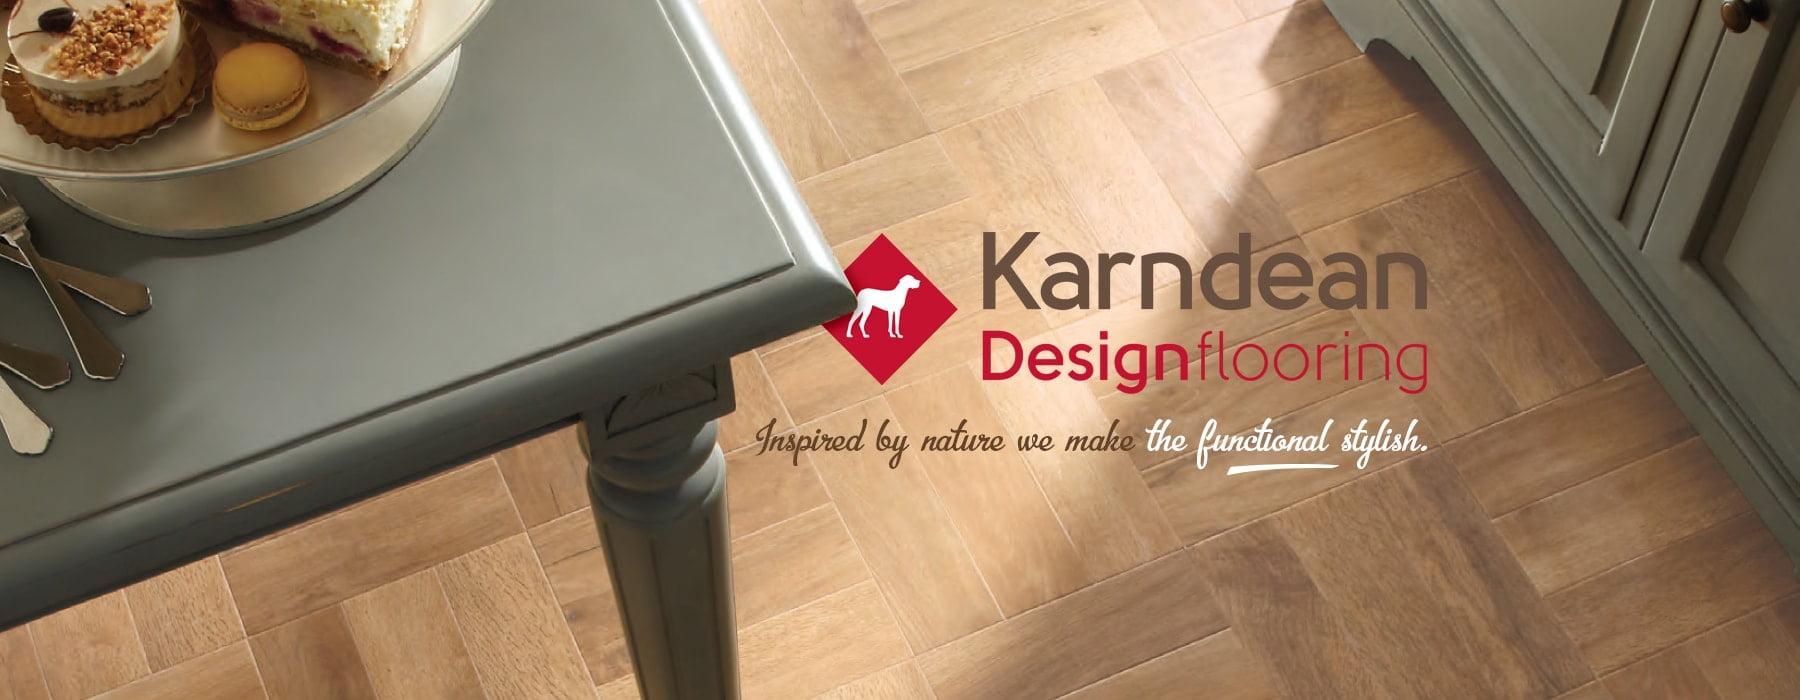 Karndean-Banner-3-min